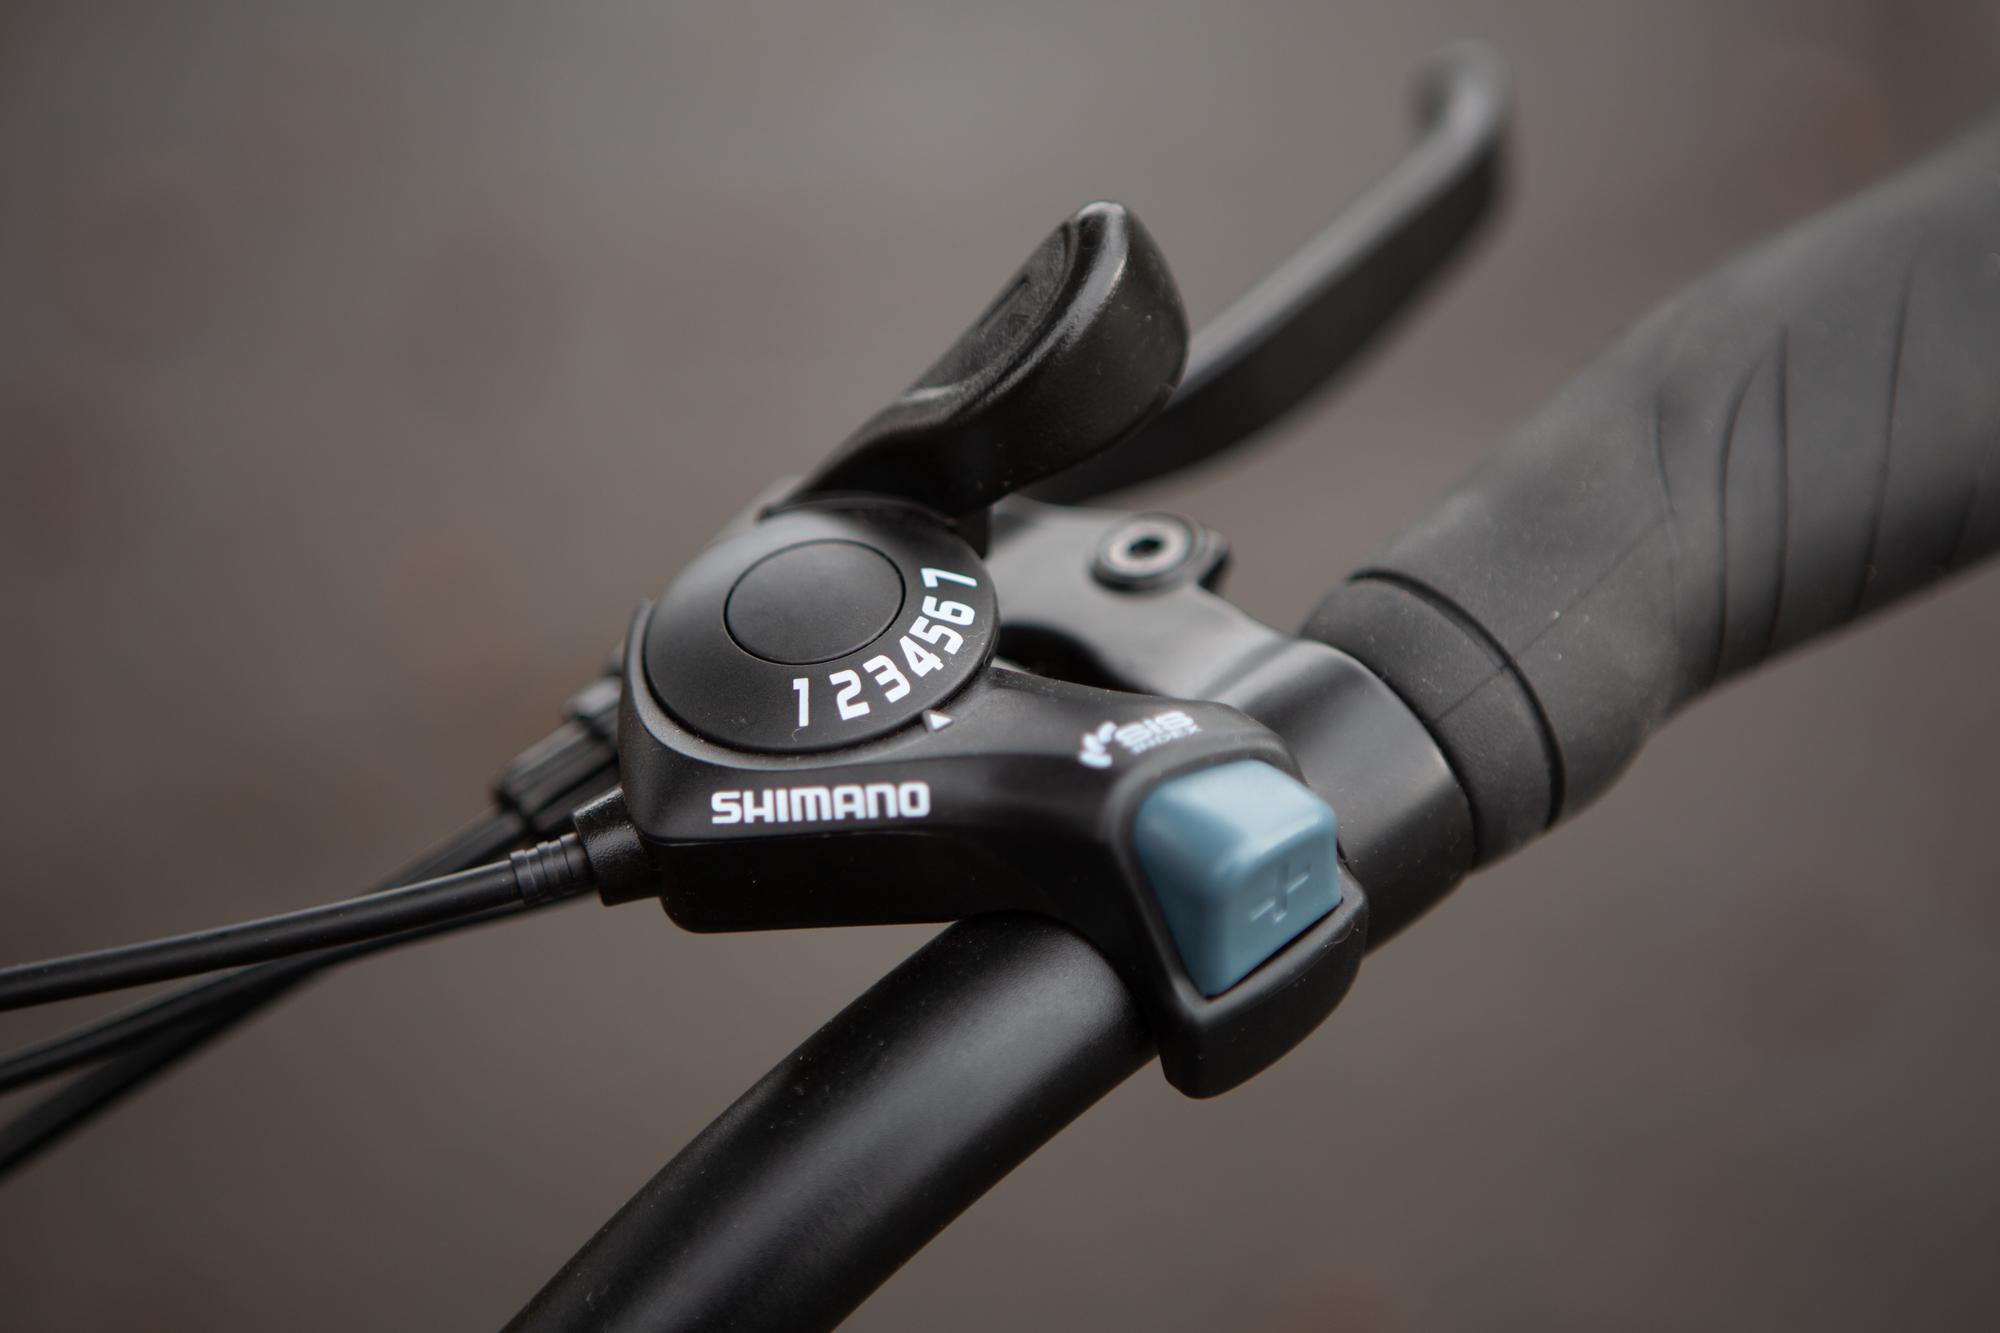 Ride1Up Core 5 Shimano shifter